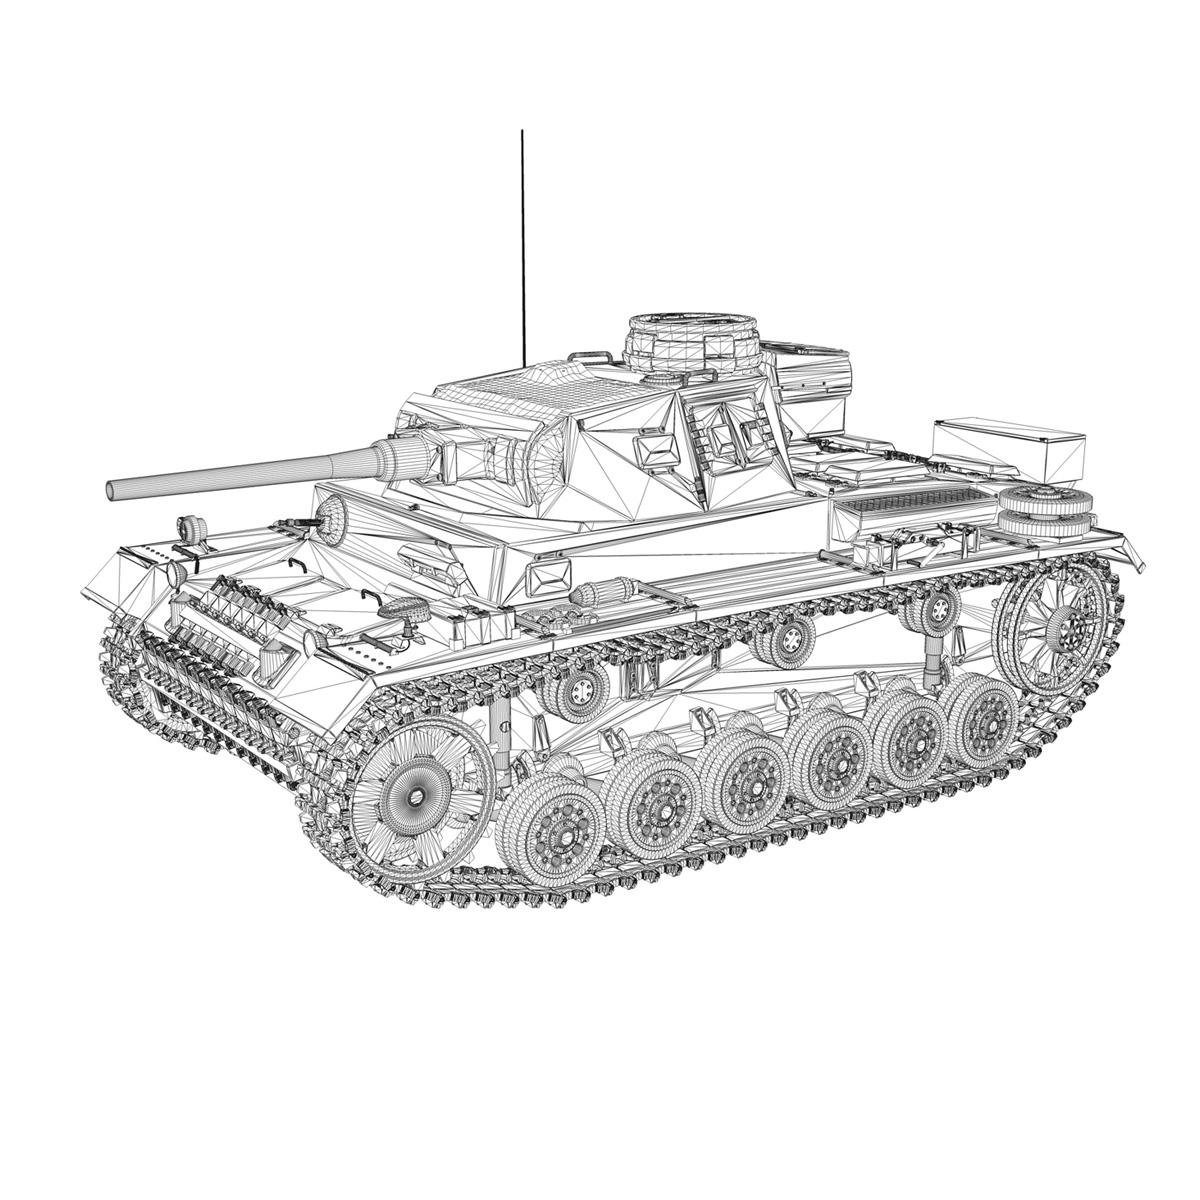 pzkpfw iii – panzer 3 – ausf.j – 624 3d model 3ds fbx lwo lw lws obj c4d 265309